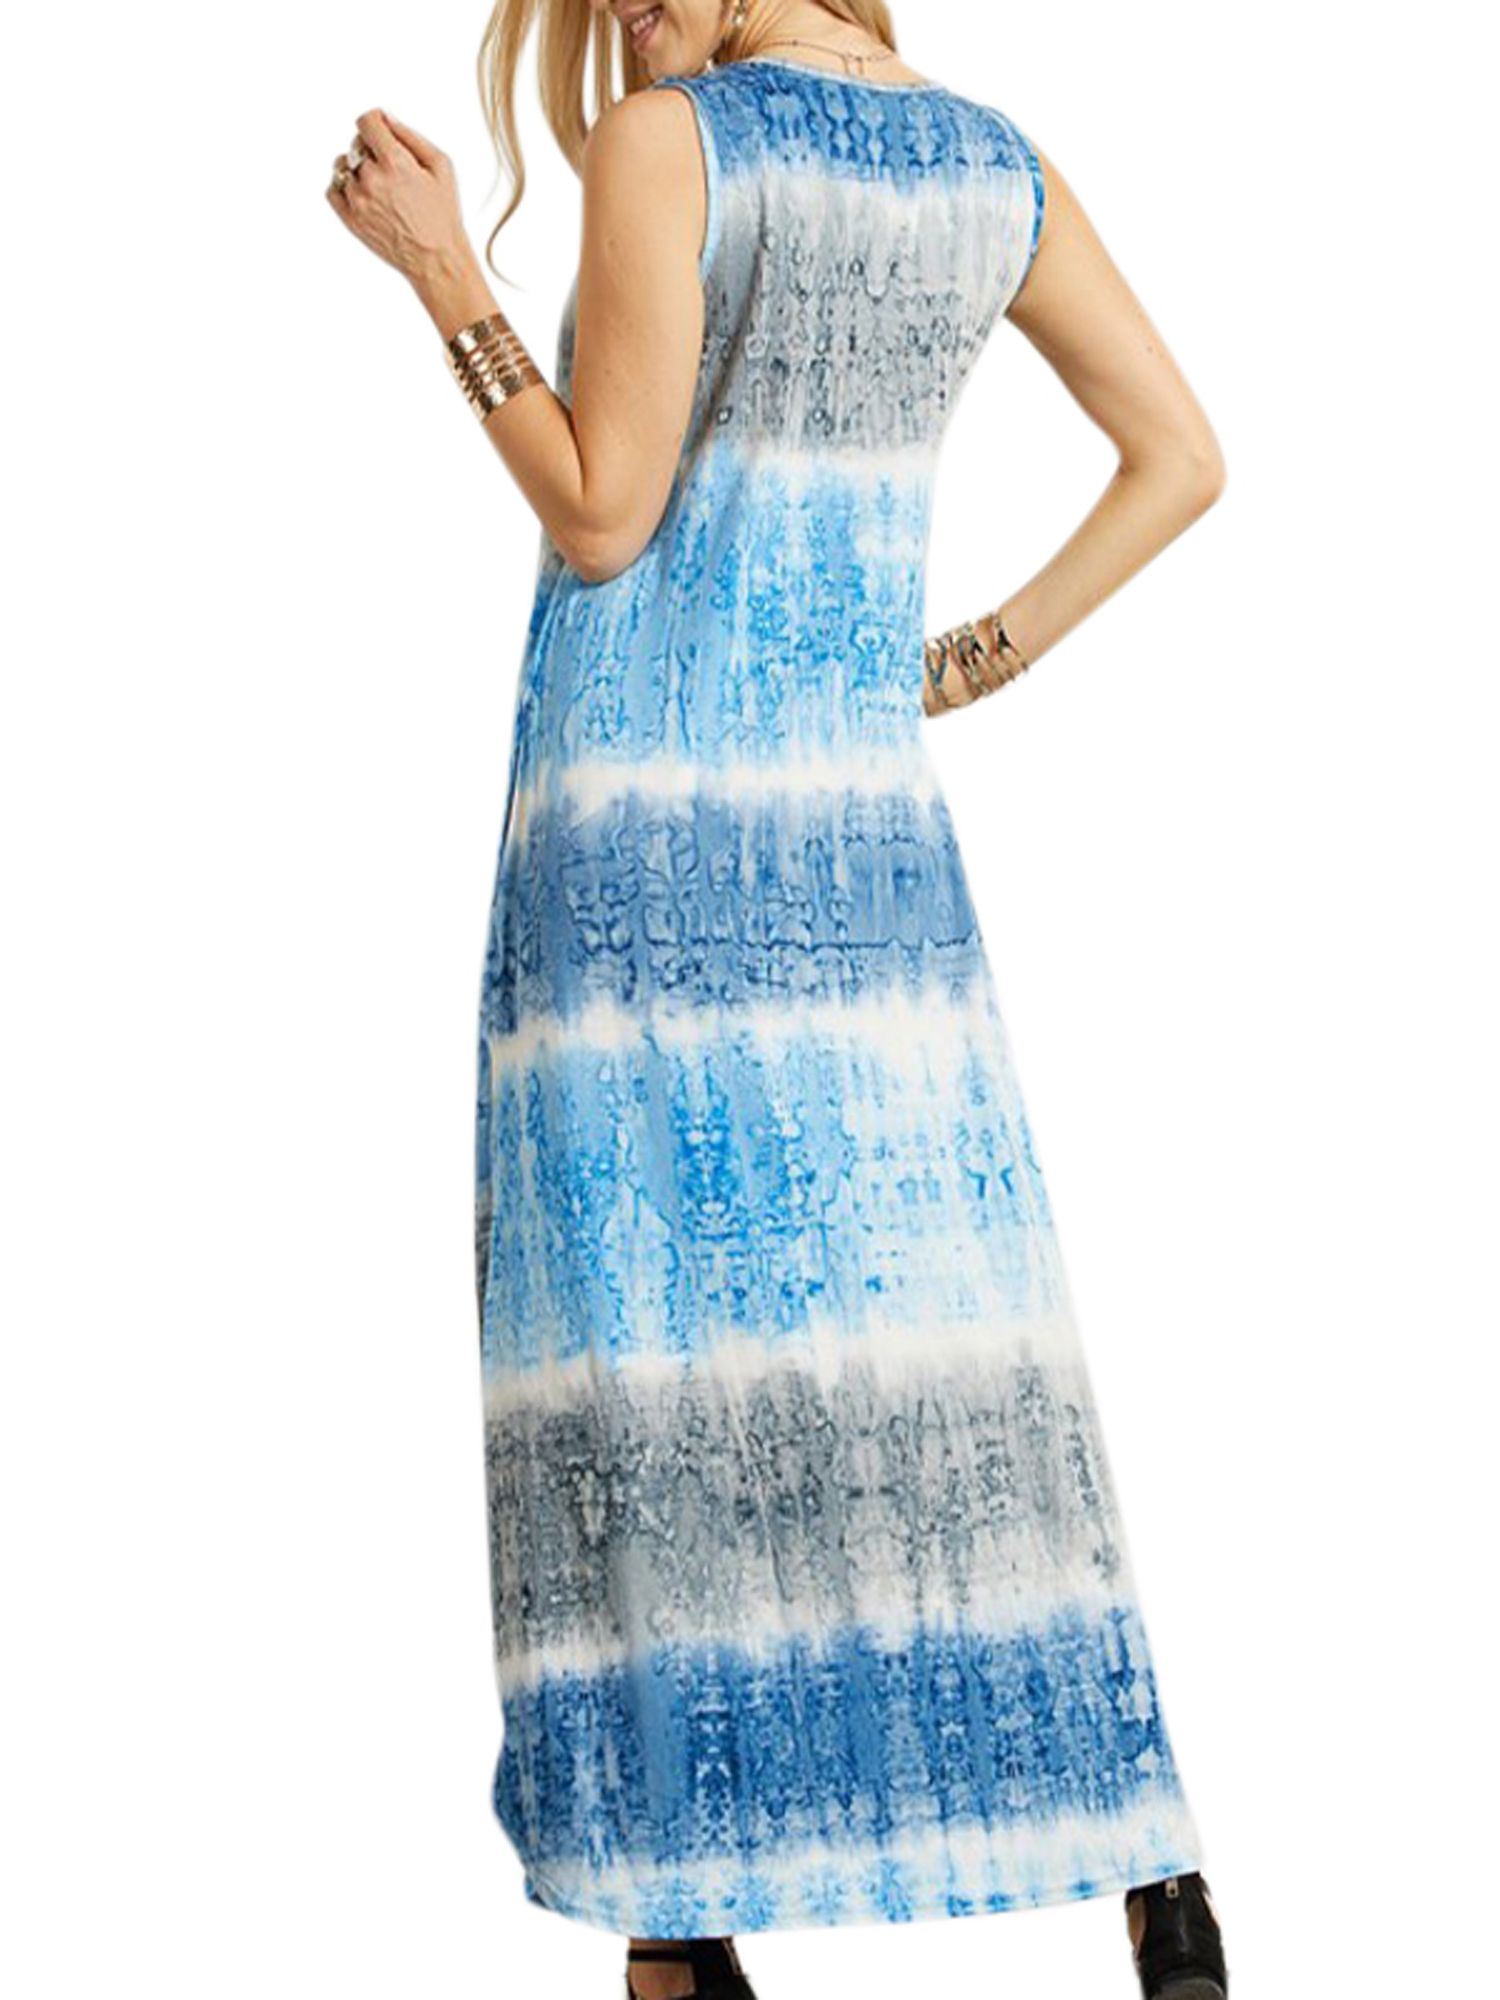 Wodstyle Women S Tie Dye Summer Plus Size Kaftan Maxi Dresses Irregular Beach Sundress Walmart Com Essential Dress Kaftan Maxi Dress Womens Tie [ 2000 x 1500 Pixel ]